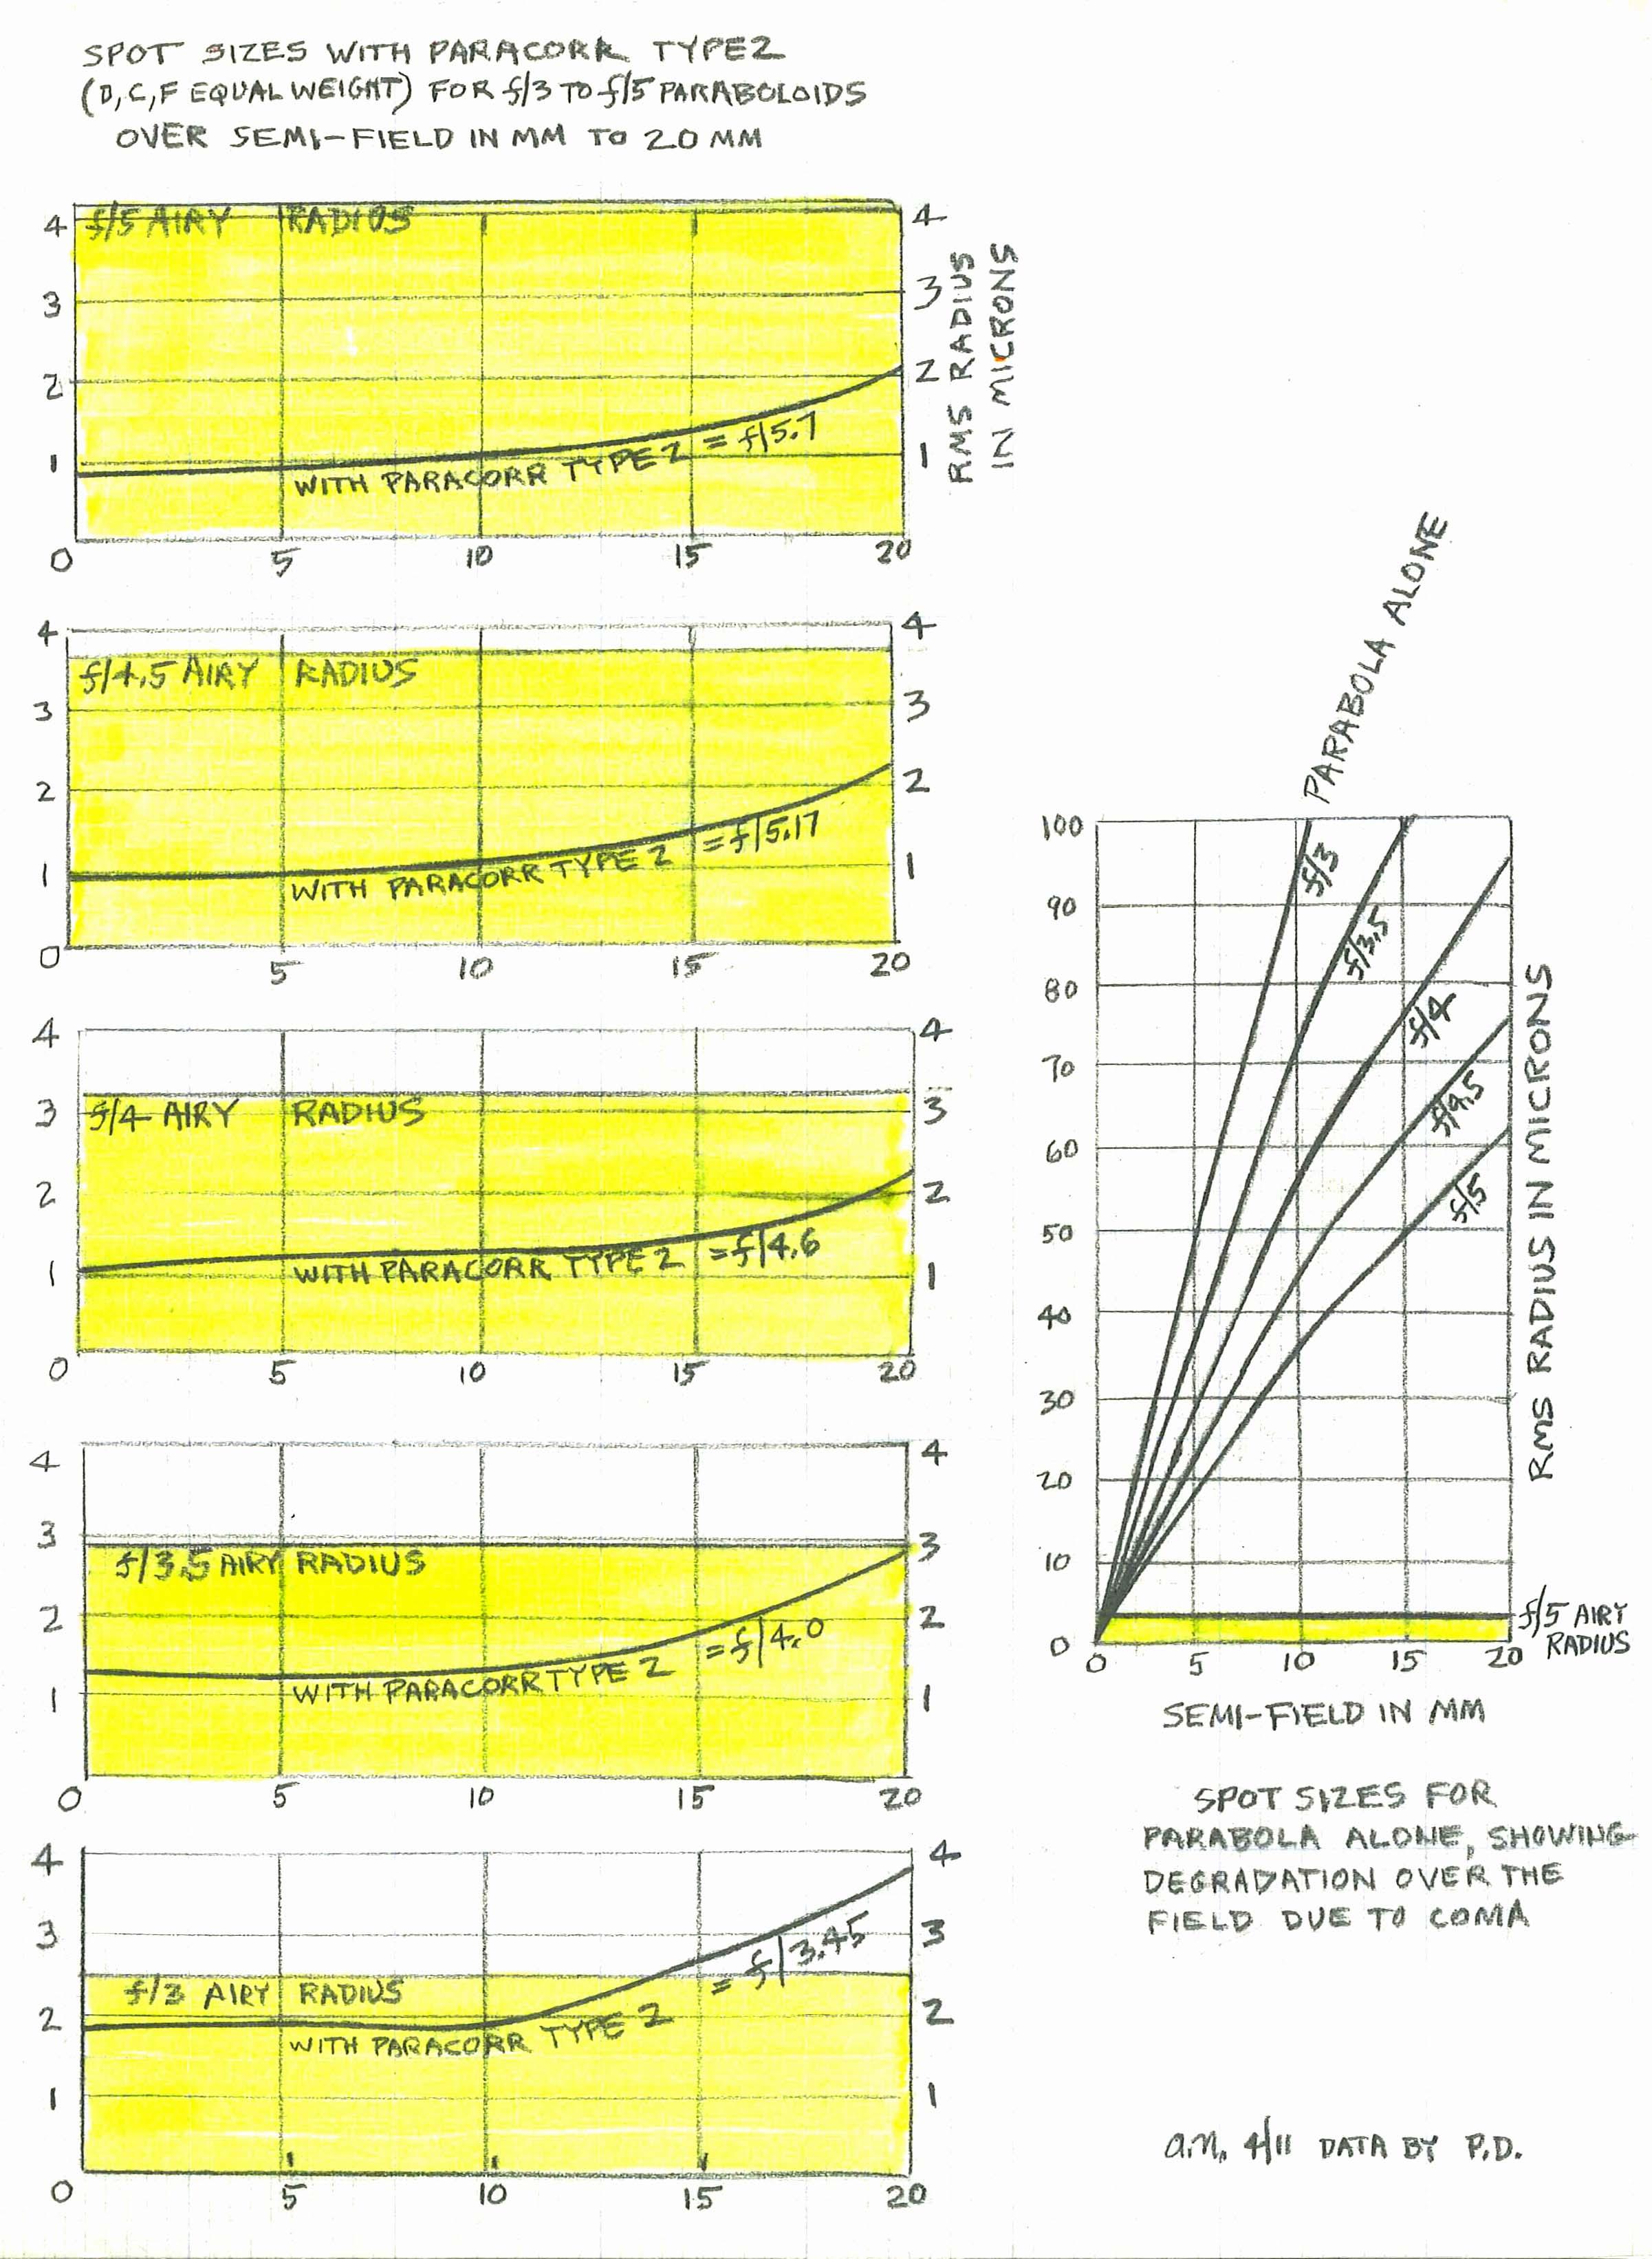 Paracorr_2_chart.jpg